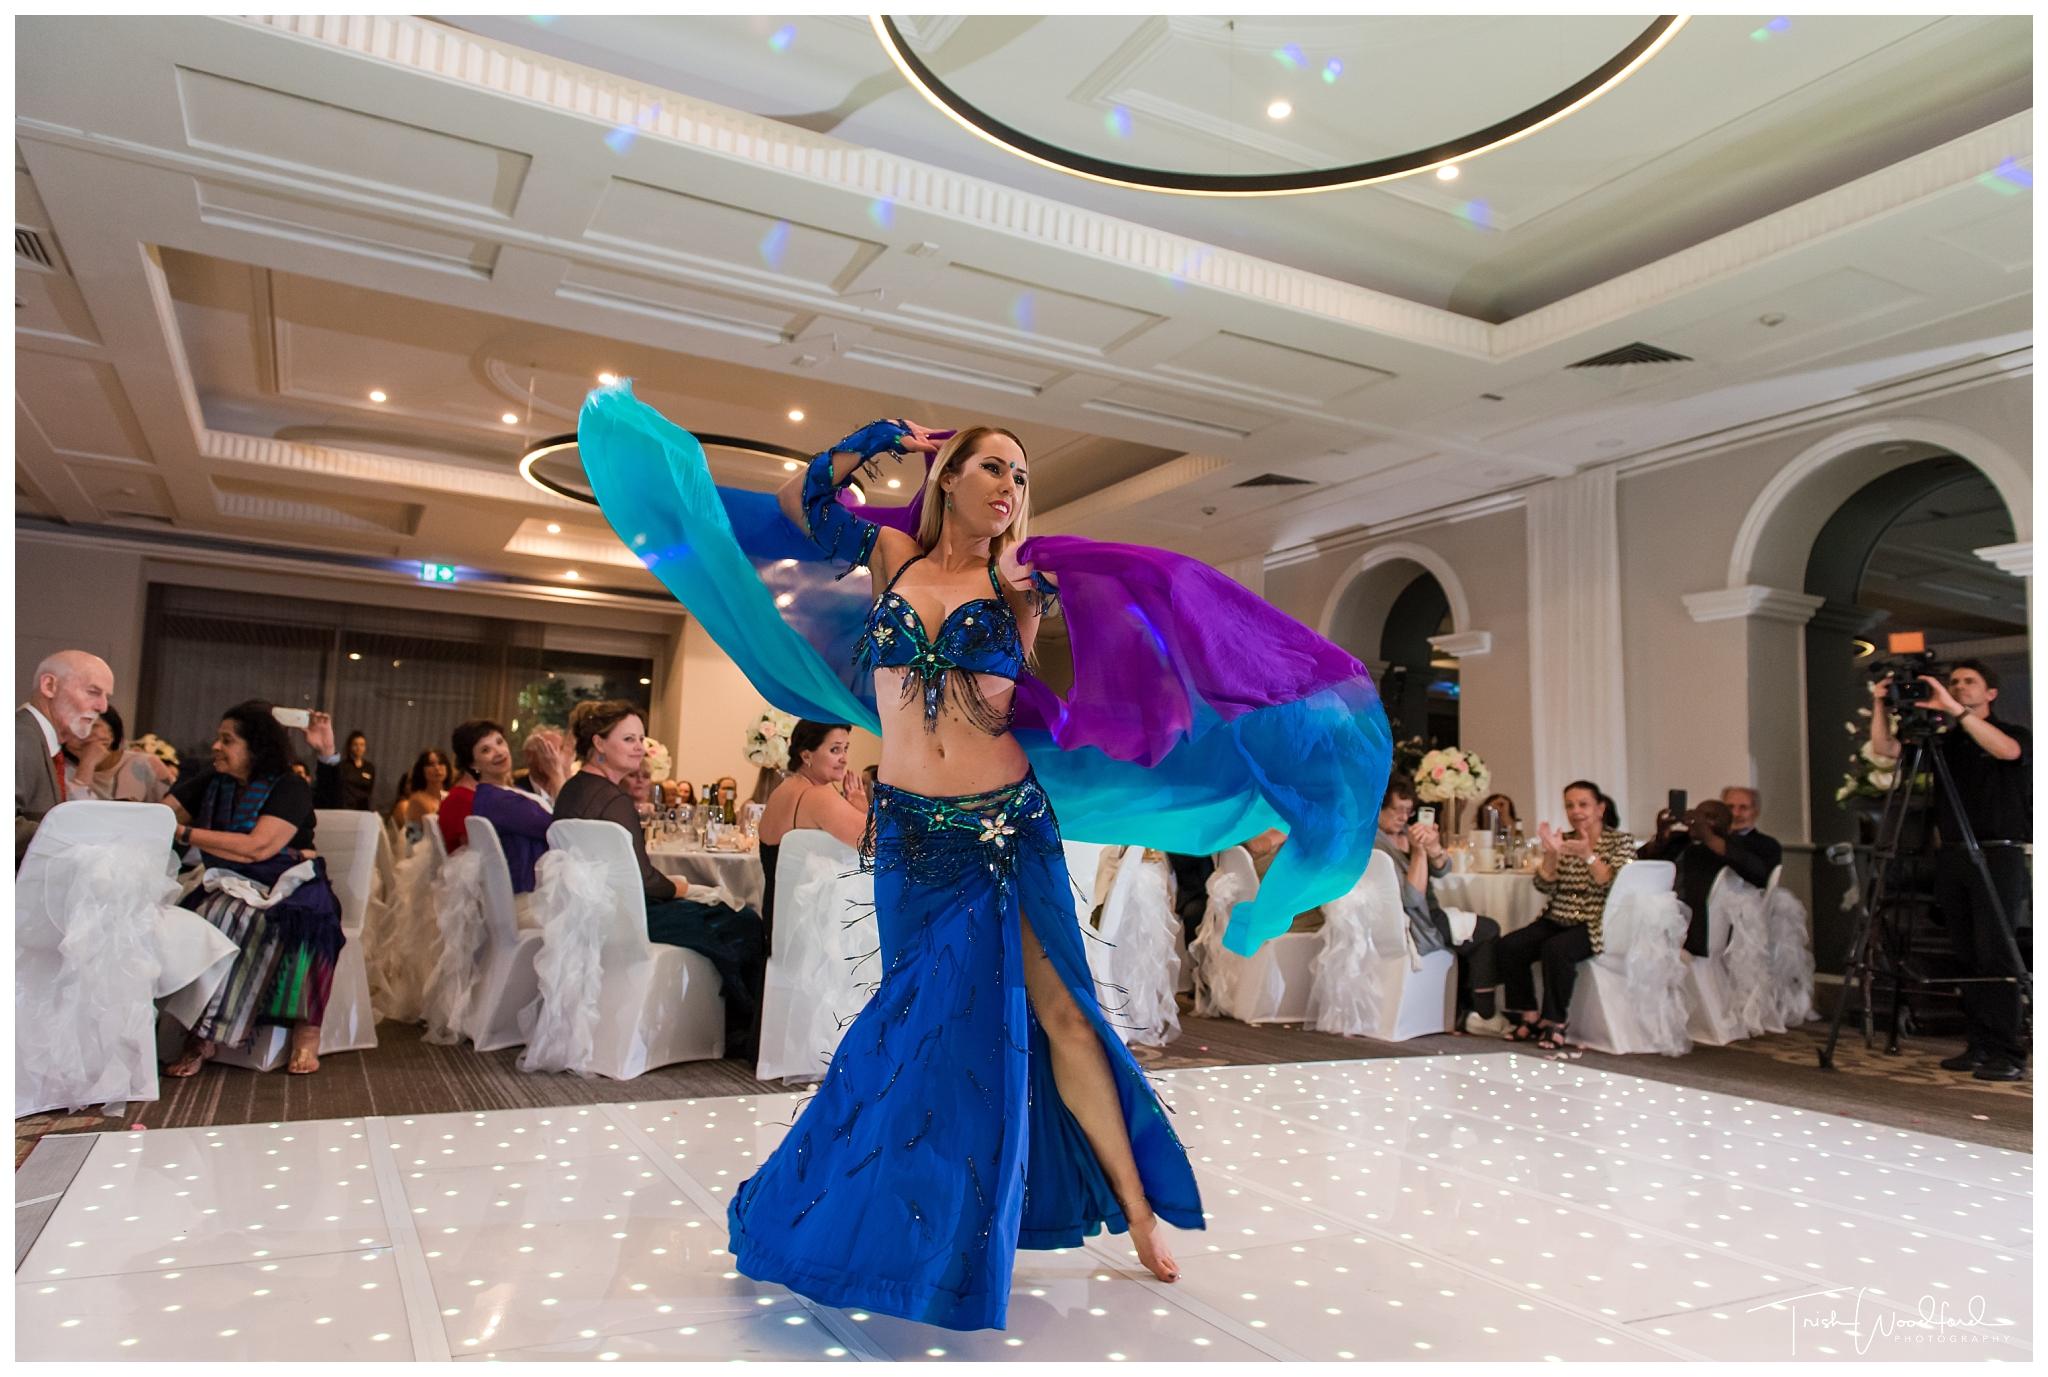 Perth Wedding Belly Dancer